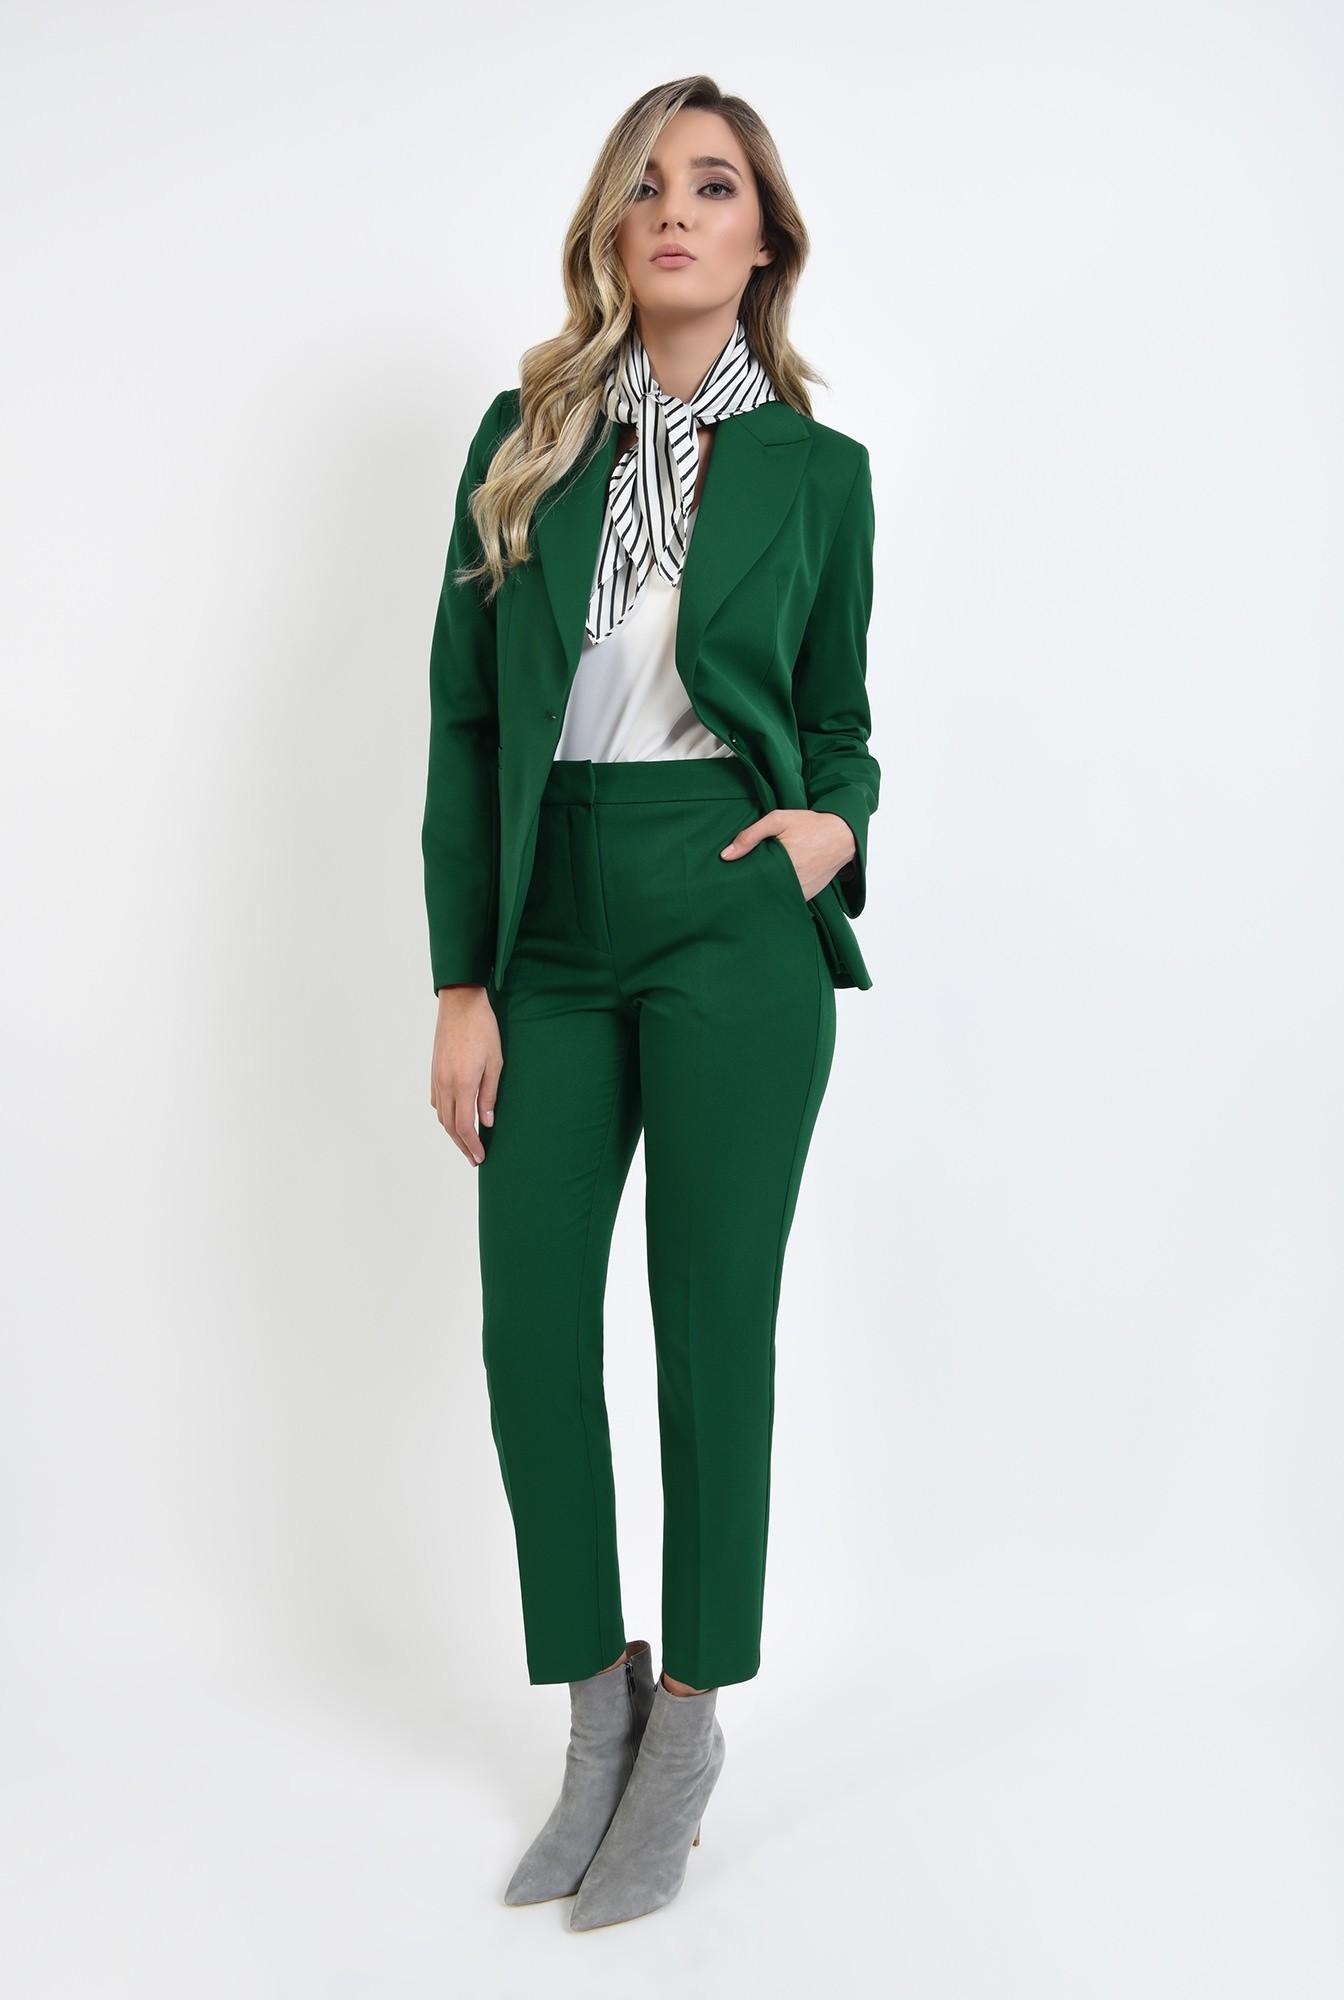 0 - pantaloni cu talie medie, croi conic, casual